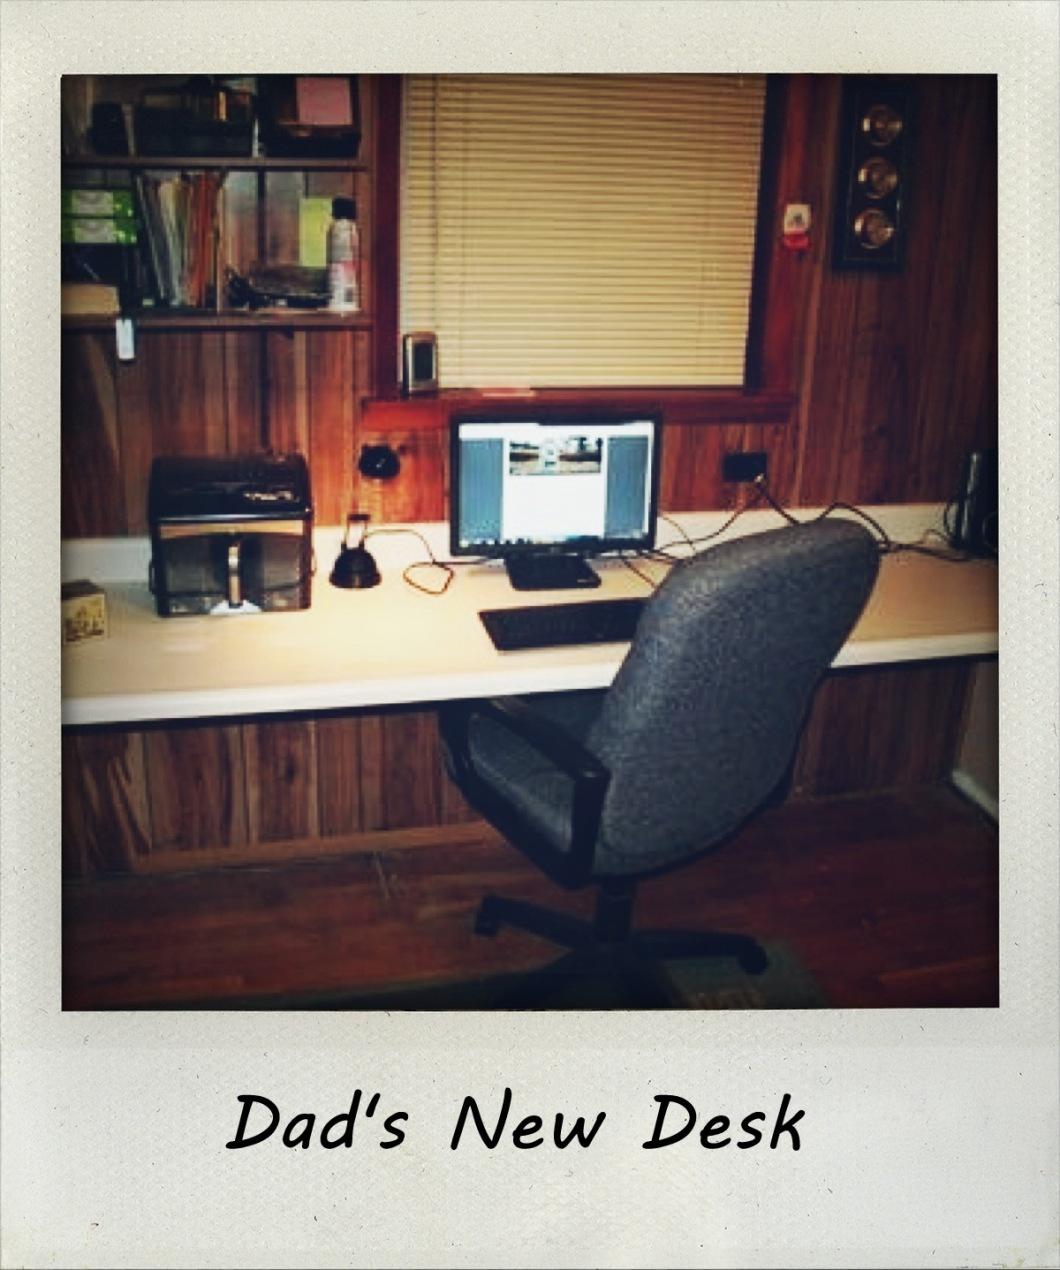 Dad's New Desk